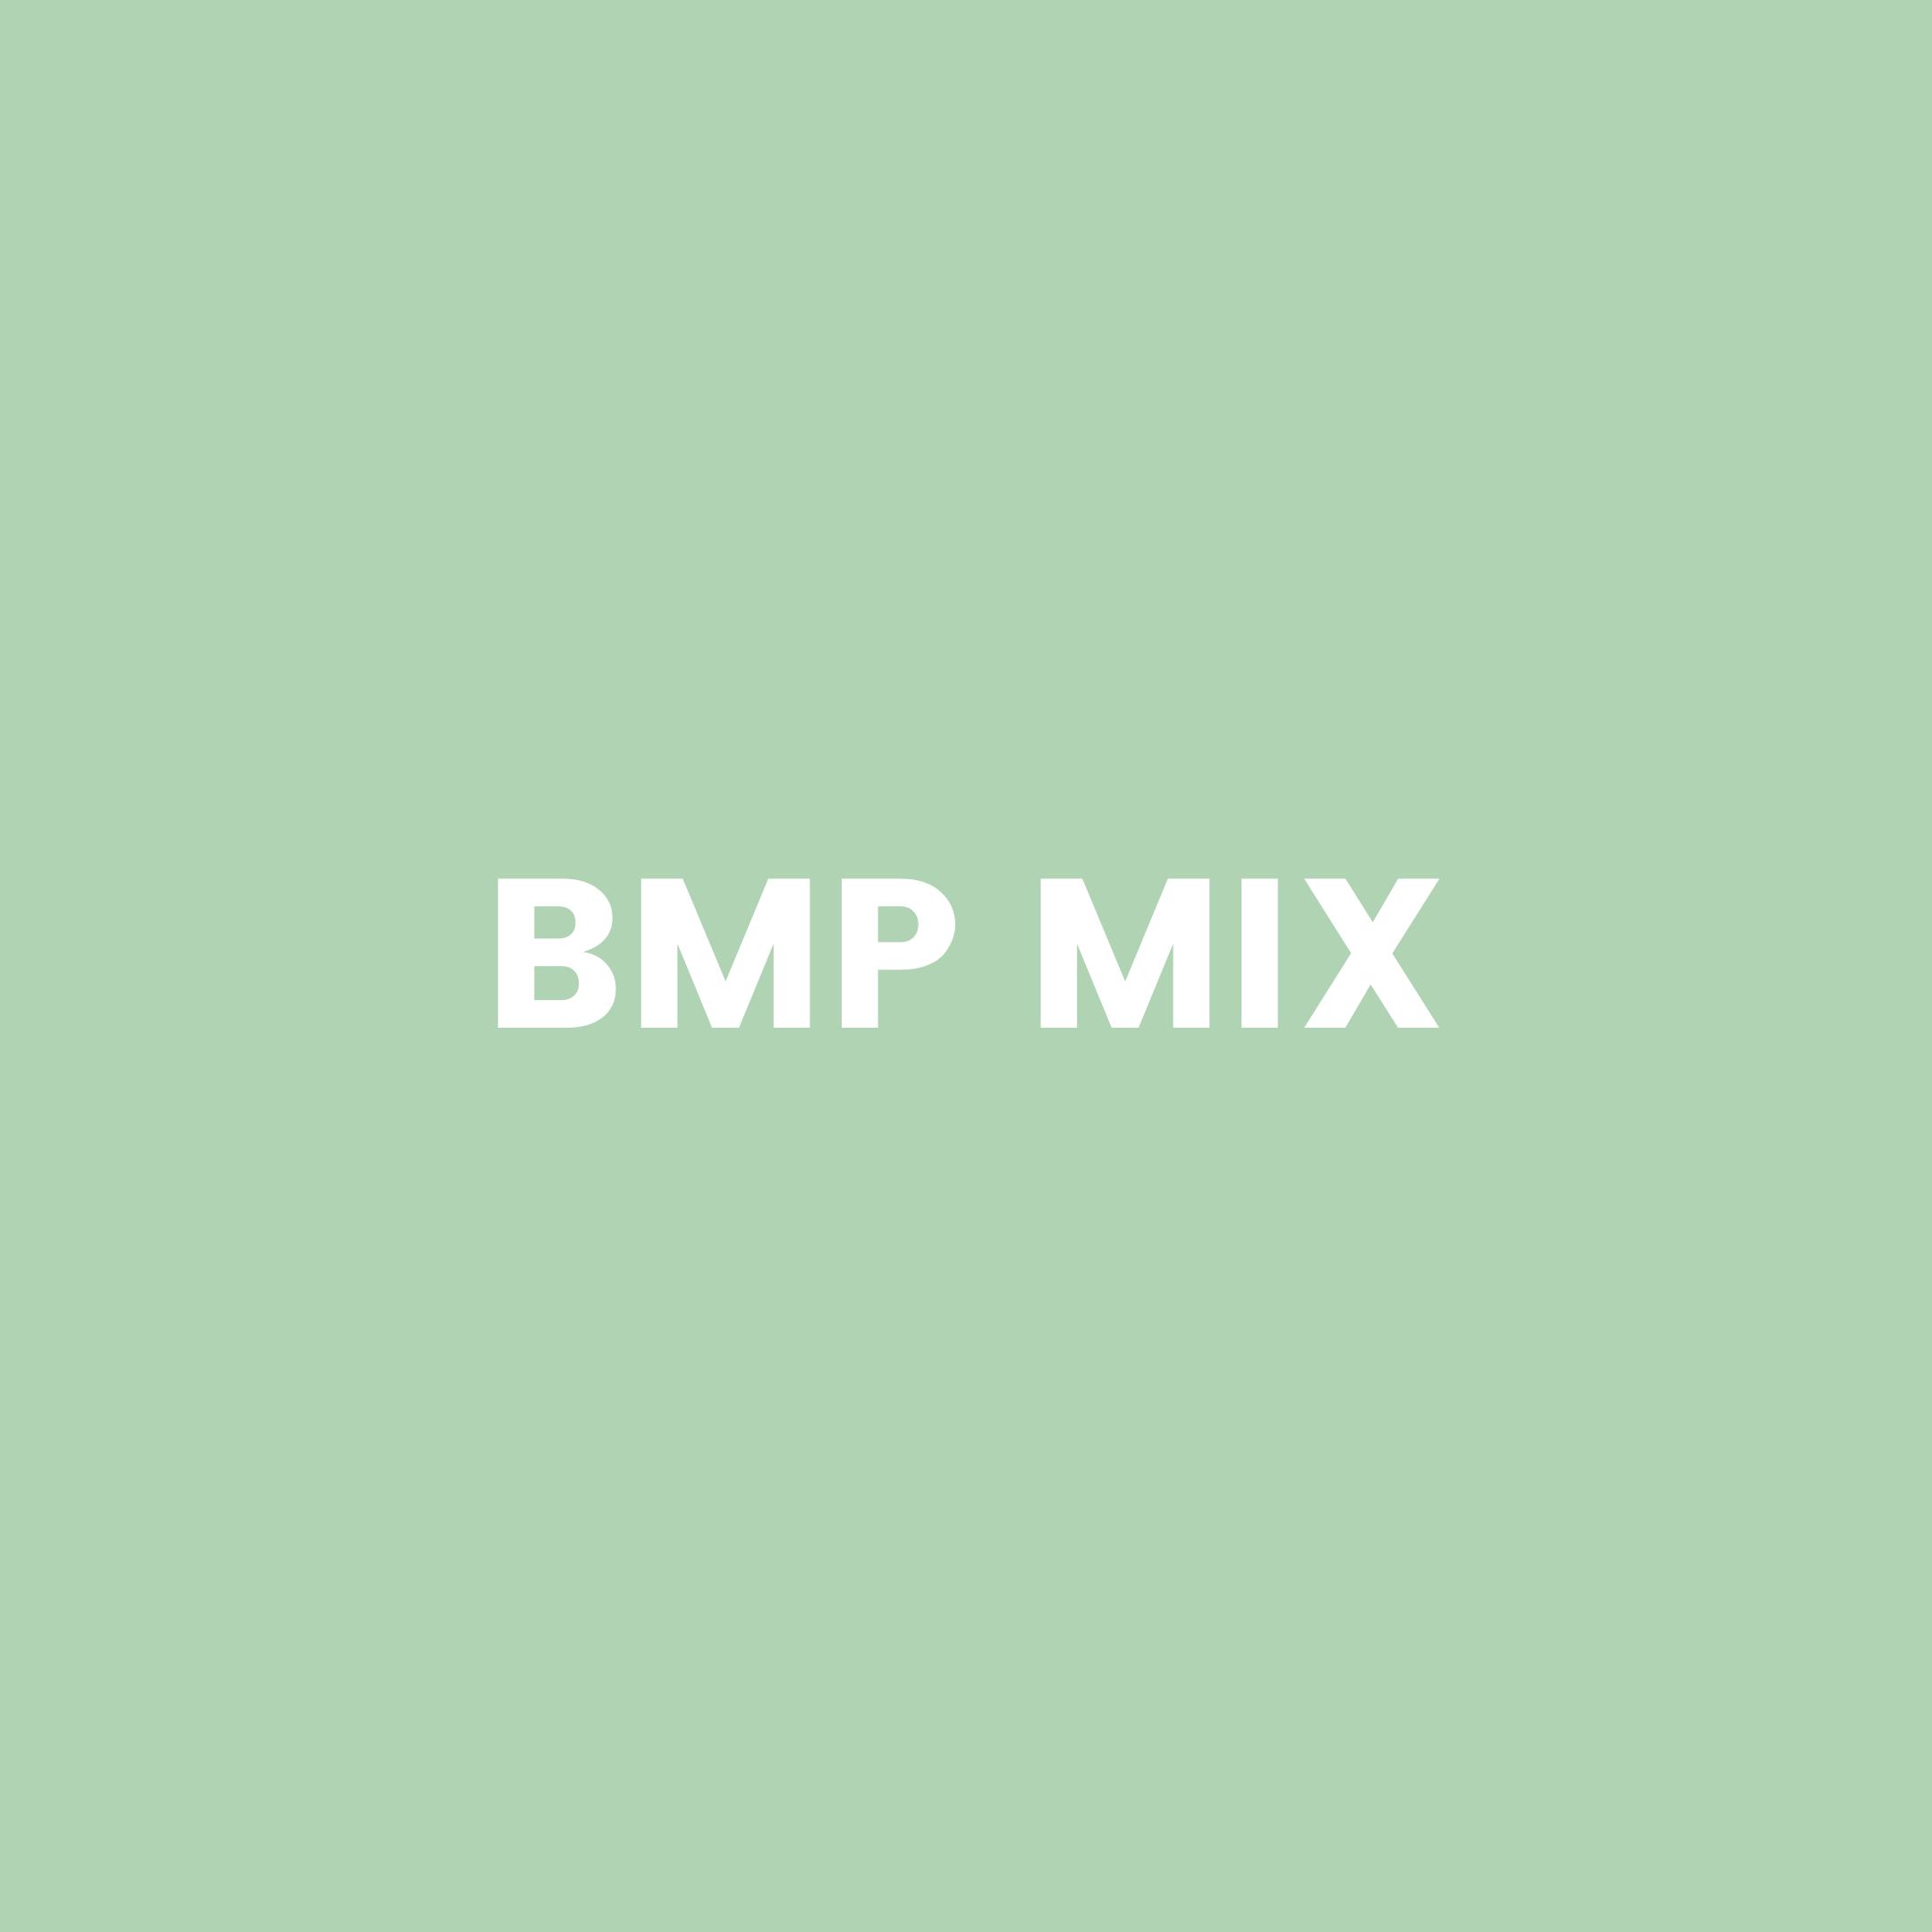 BMP Mix